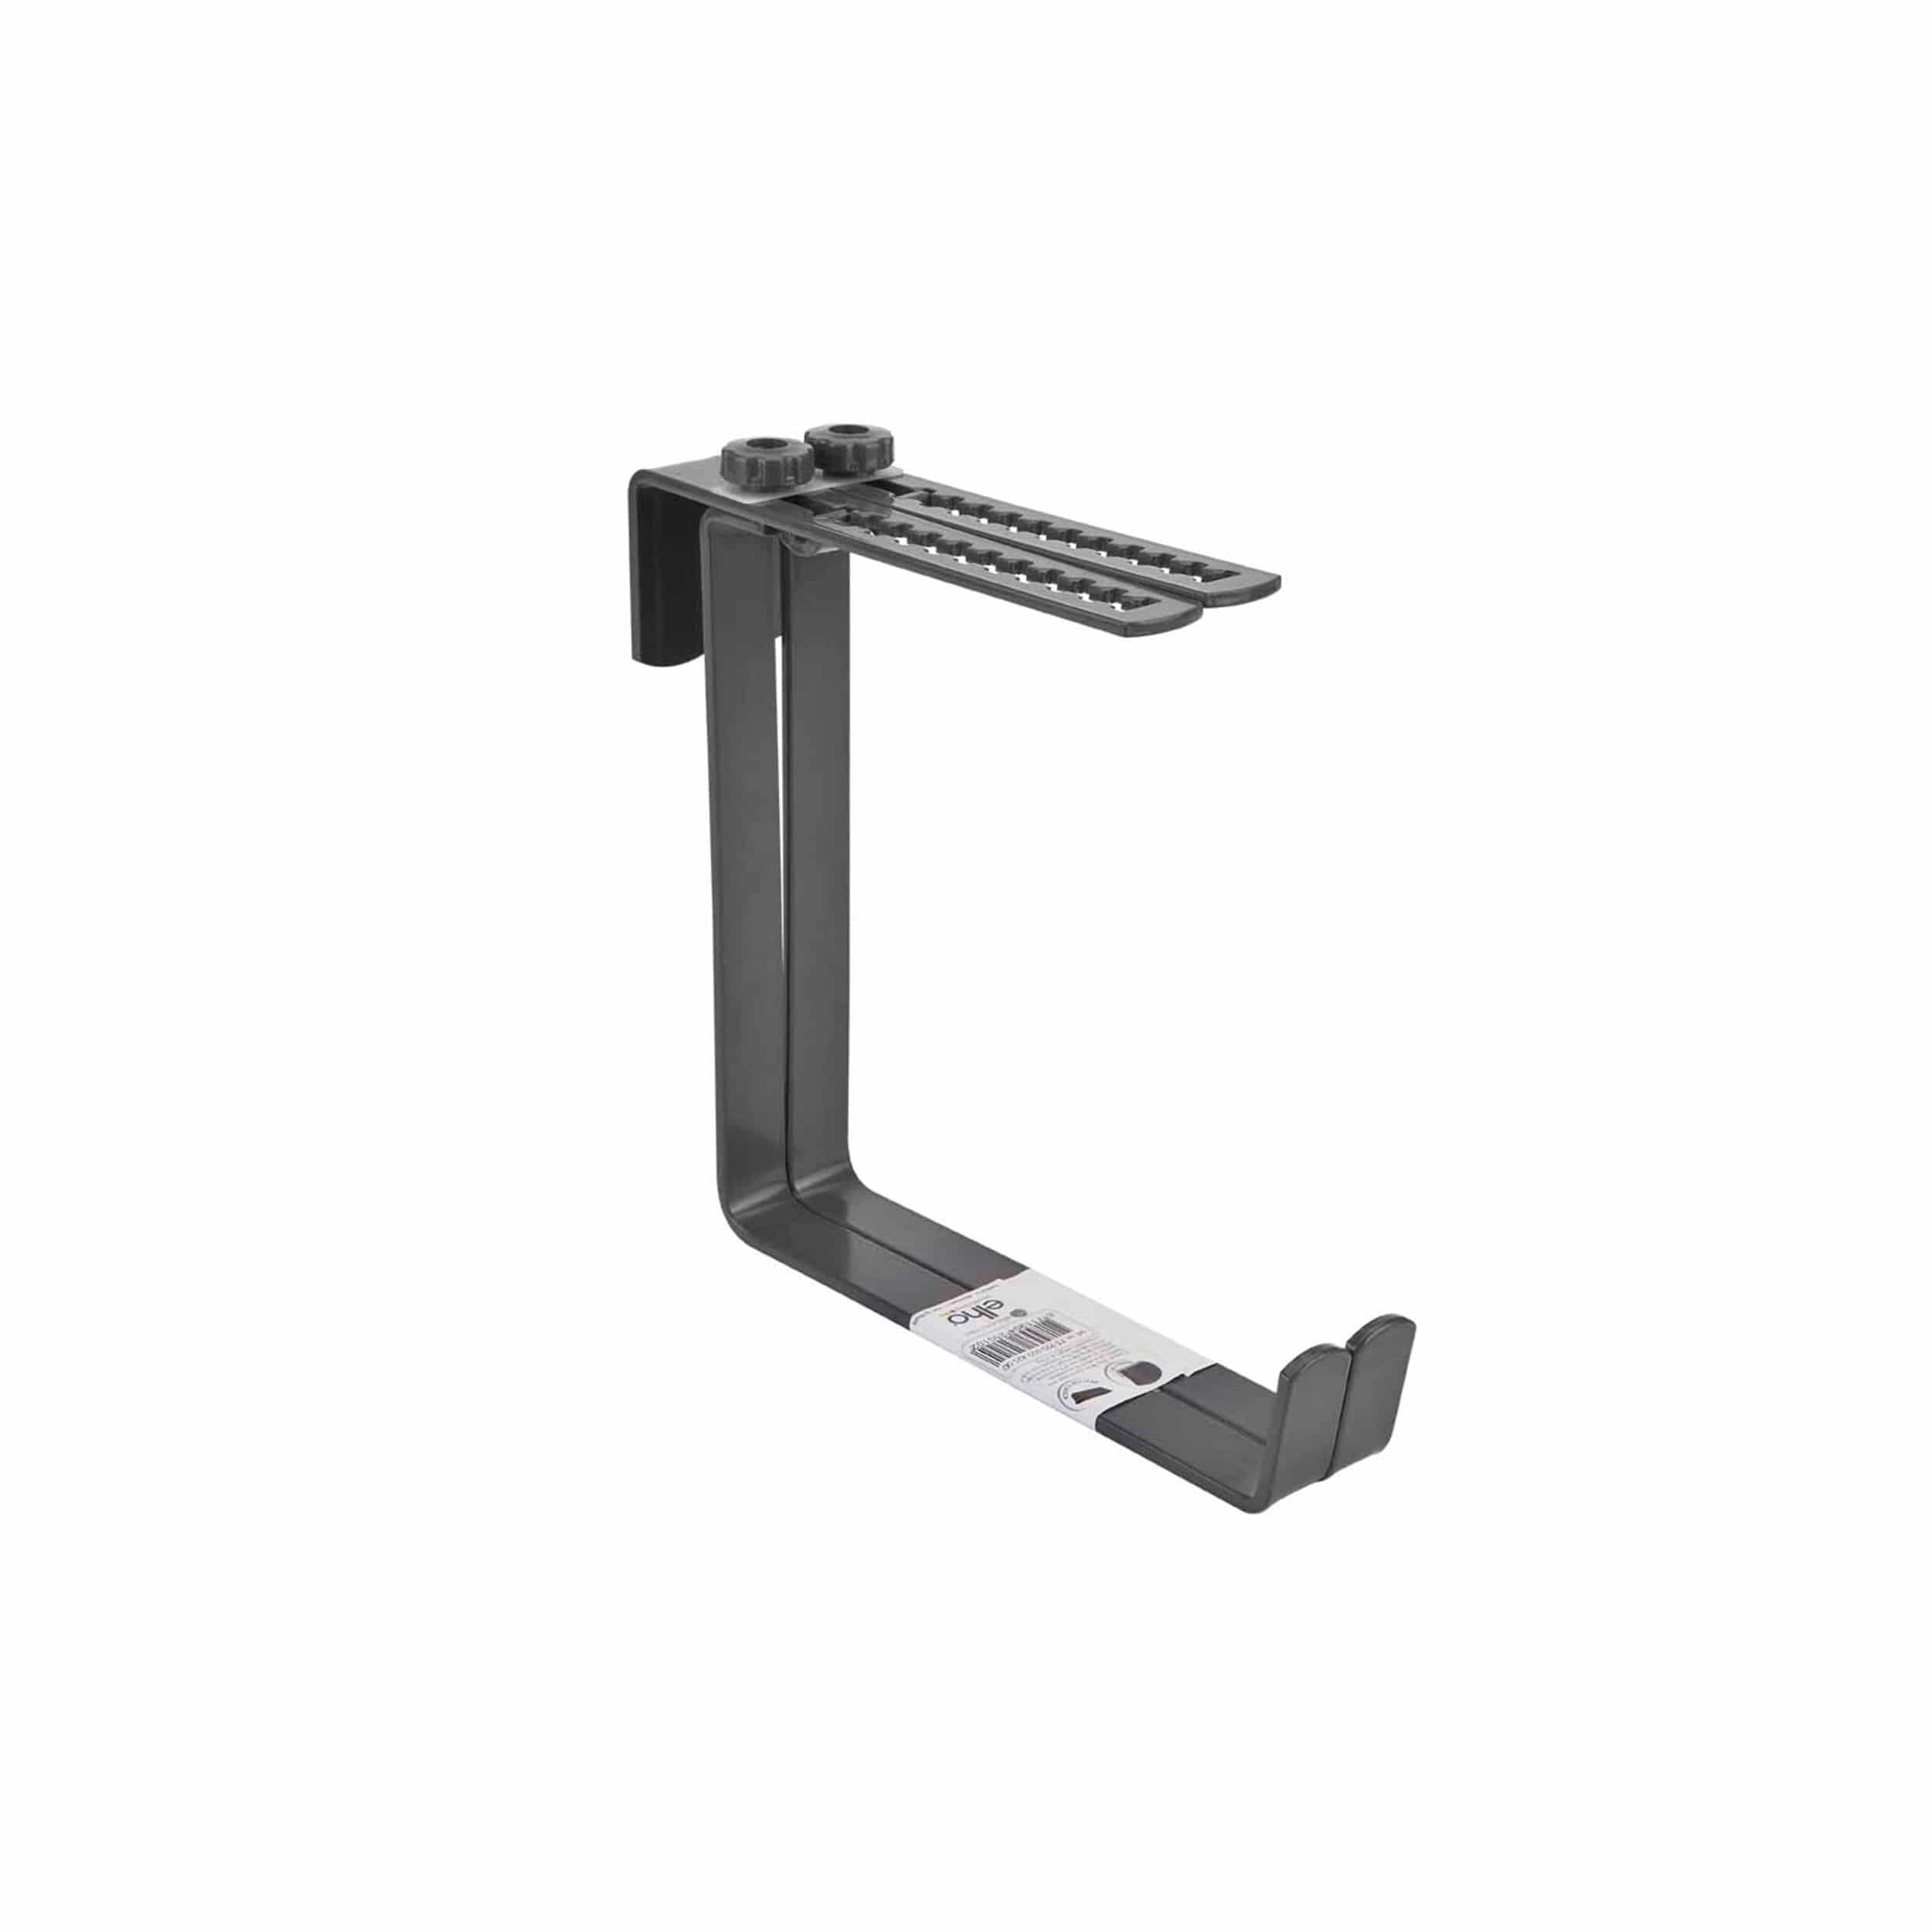 Balkonkastenhalter Set Tragkraft 30 kg